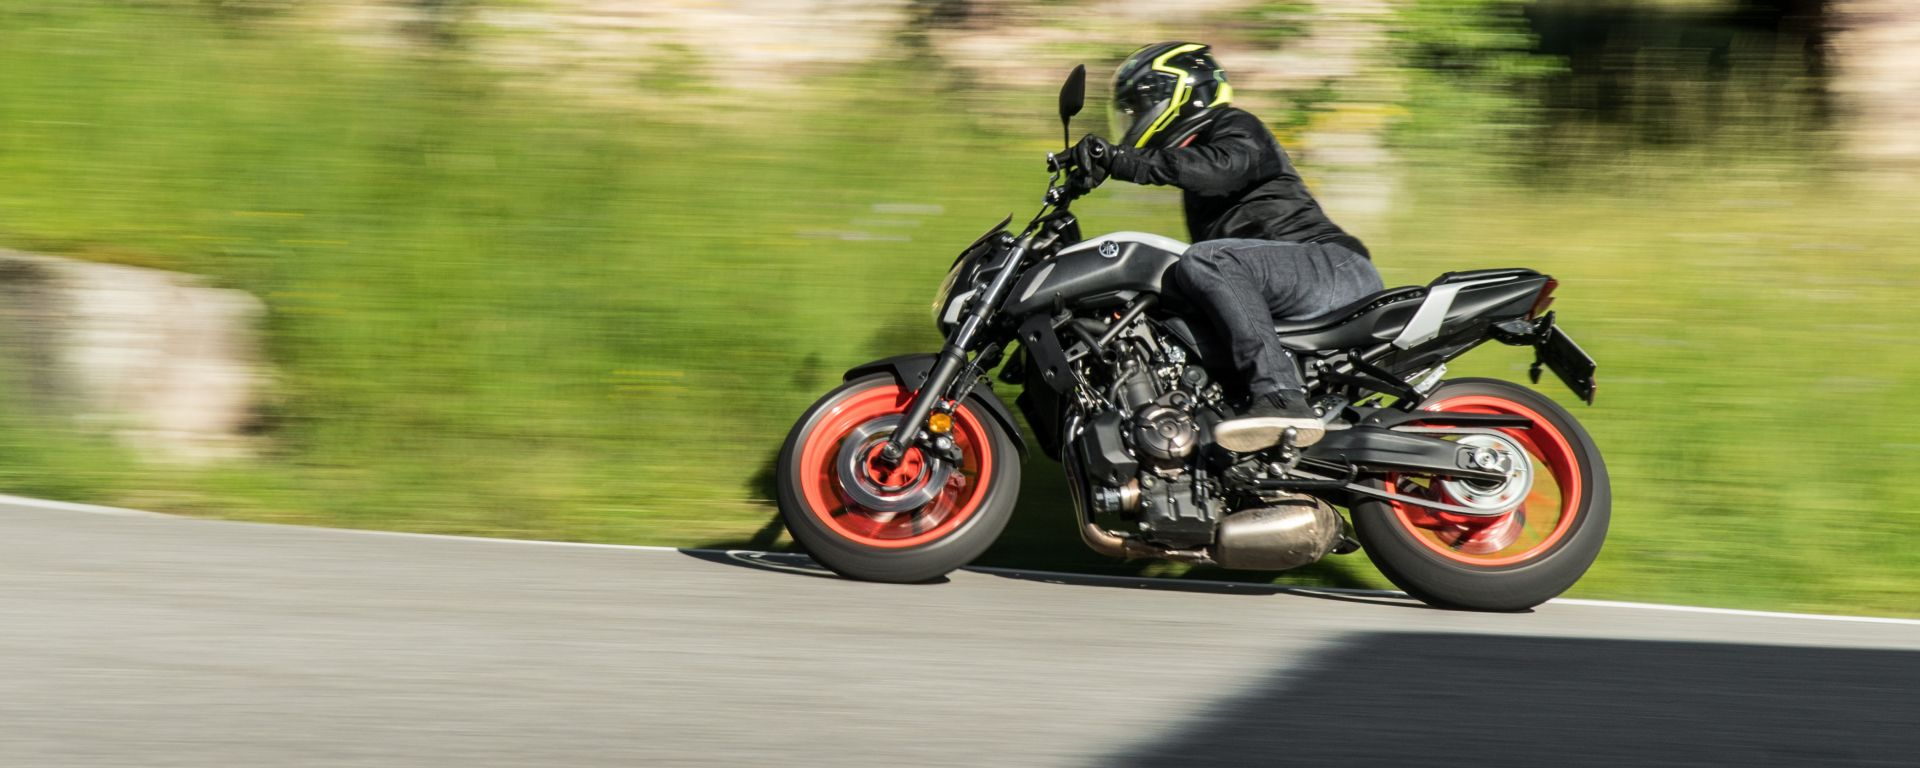 Yamaha MT-07 2020, la prova su strada